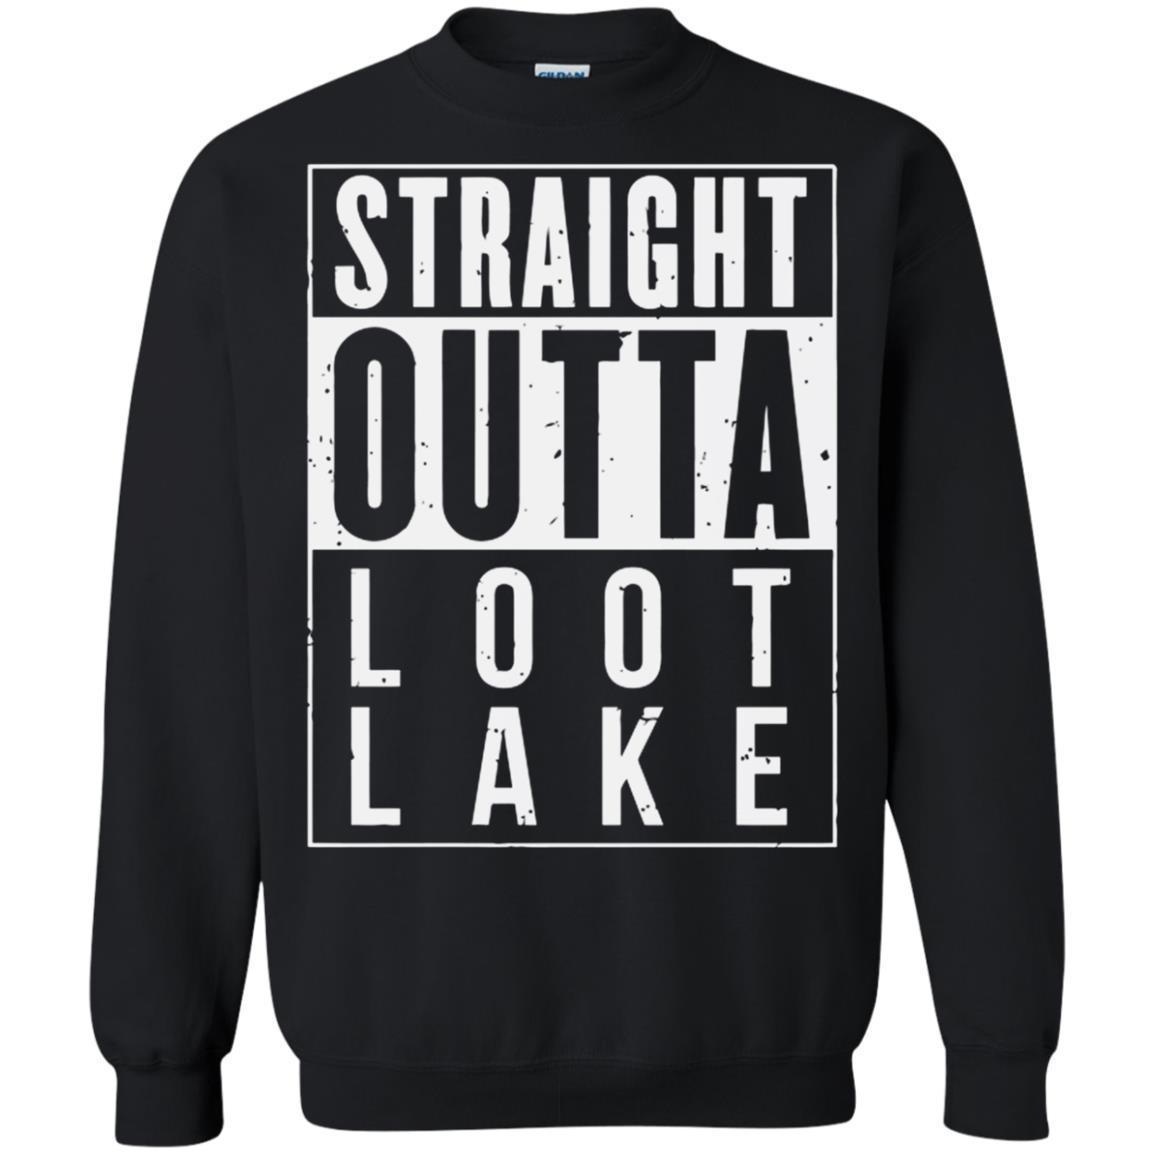 Shop Straight Outta Loot Lake Fortnite Battle Royale Shirts